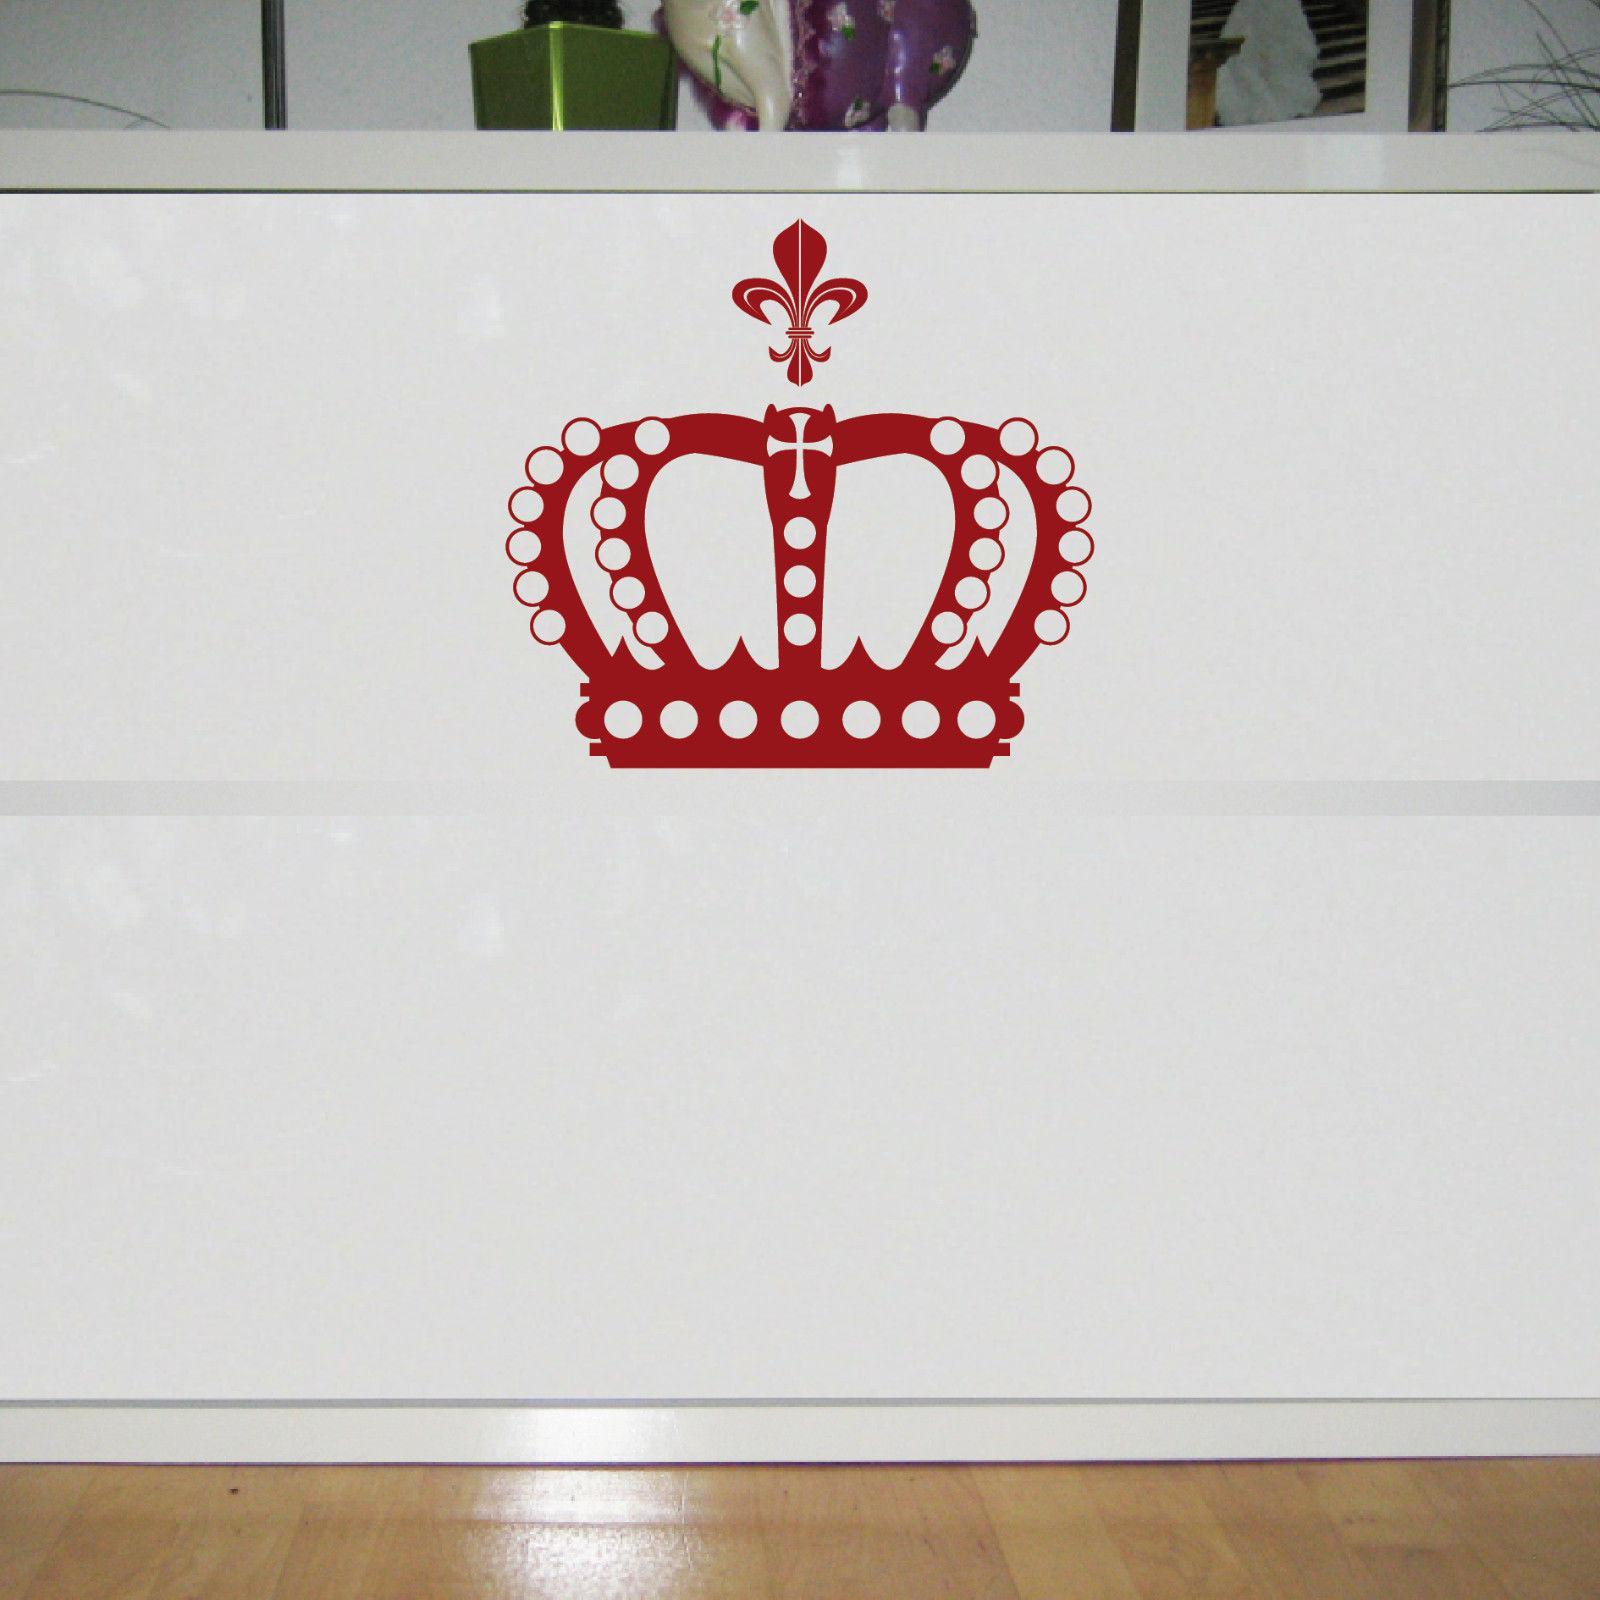 Fenster König krone 28cm lilie dunkelrot könig aufkleber auto fenster tür